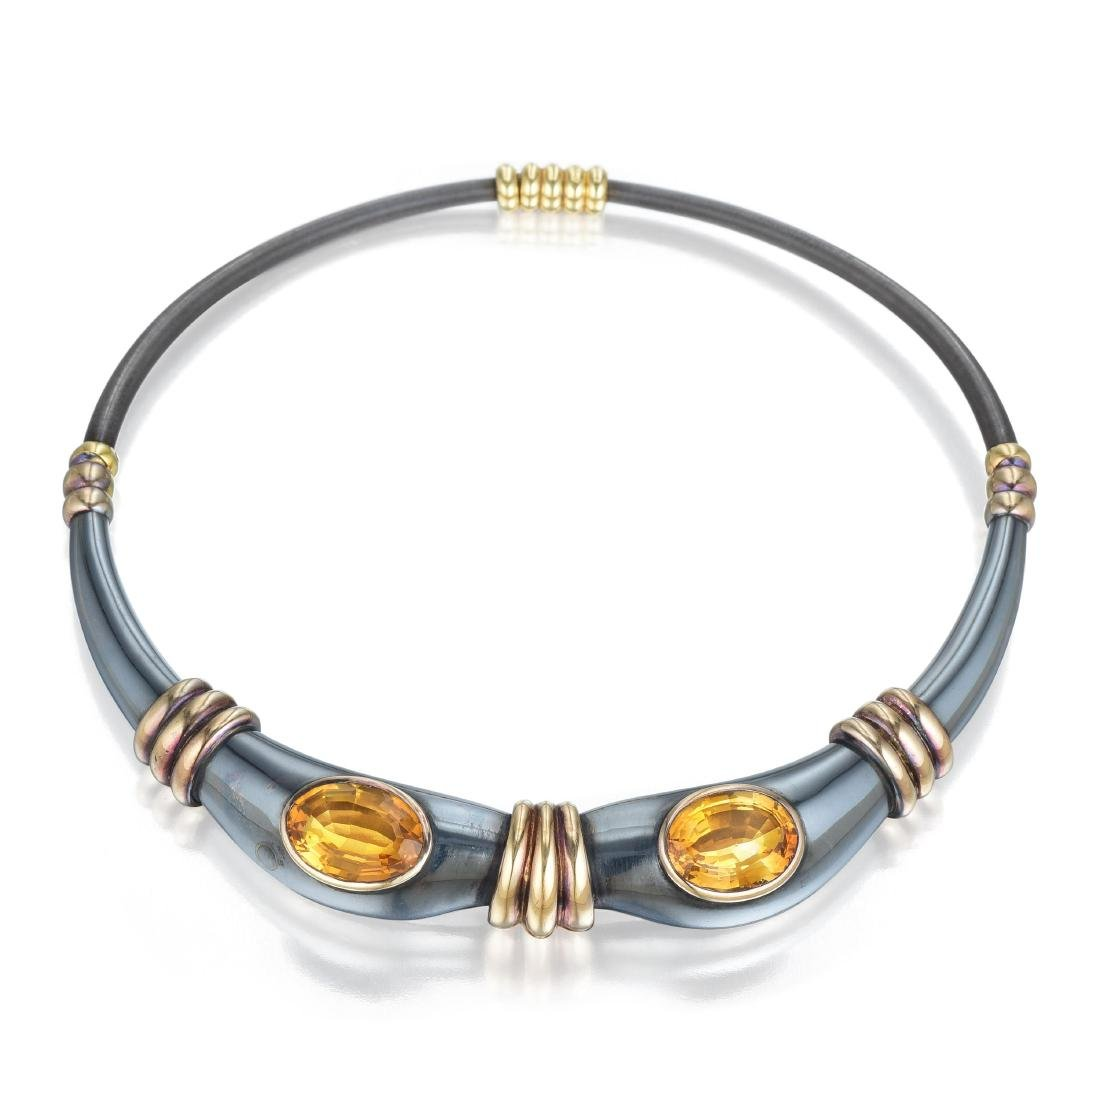 Rene Boivin Citrine Choker Necklace